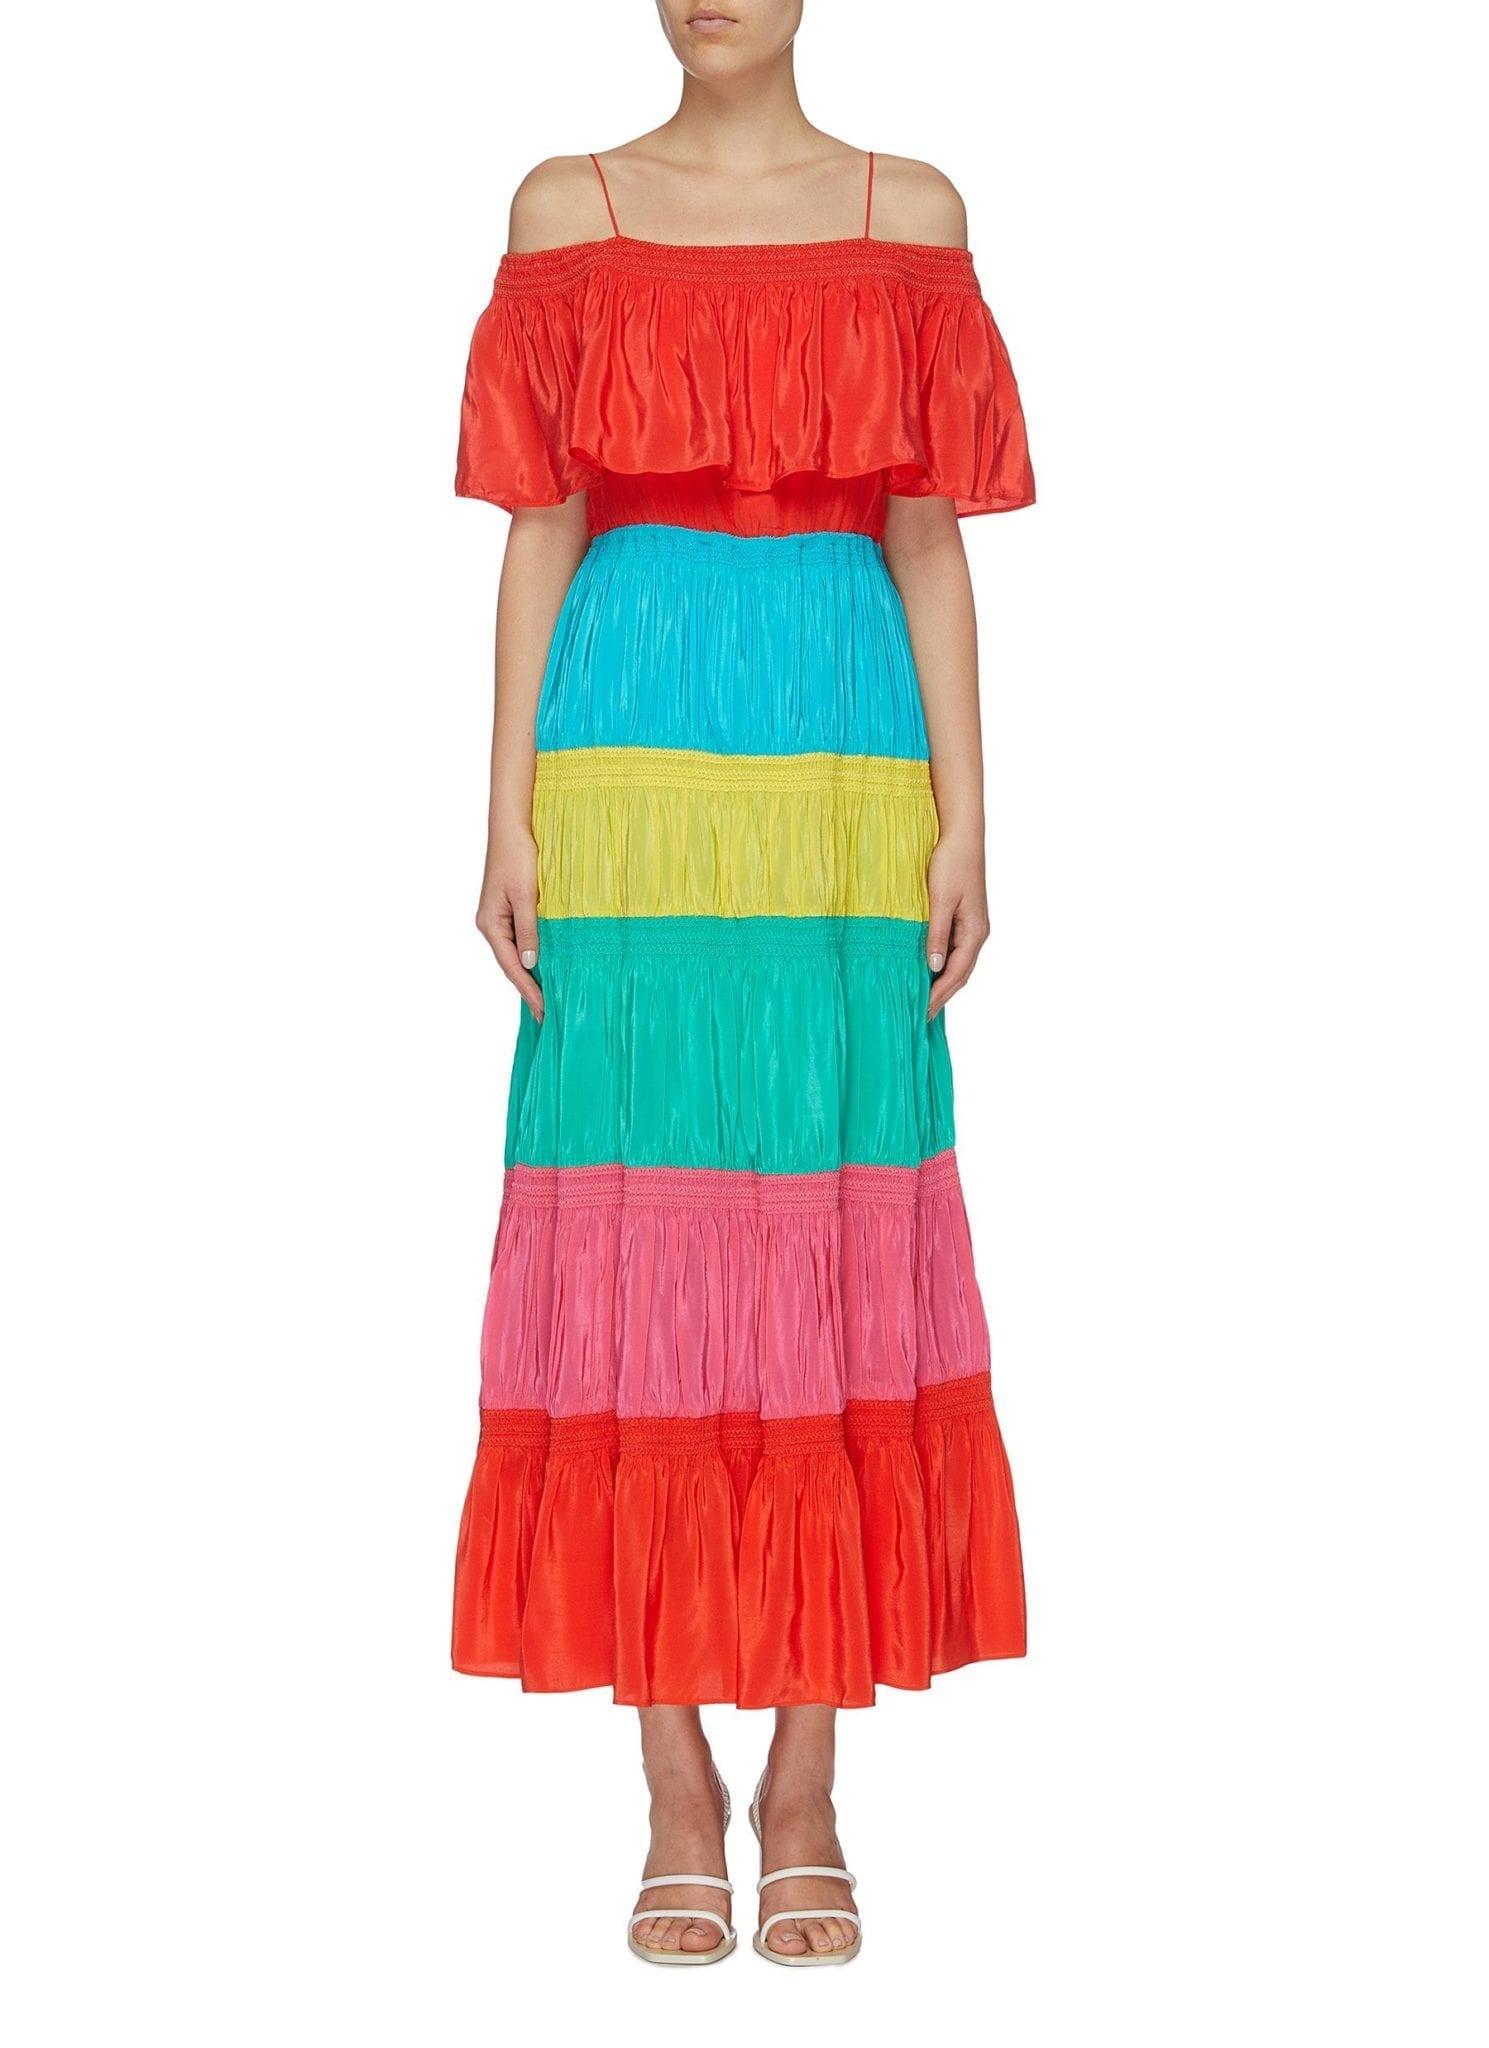 ALICE + OLIVIA 'kia' Colourblock Smocked Tiered Maxi Off-shoulder Dress